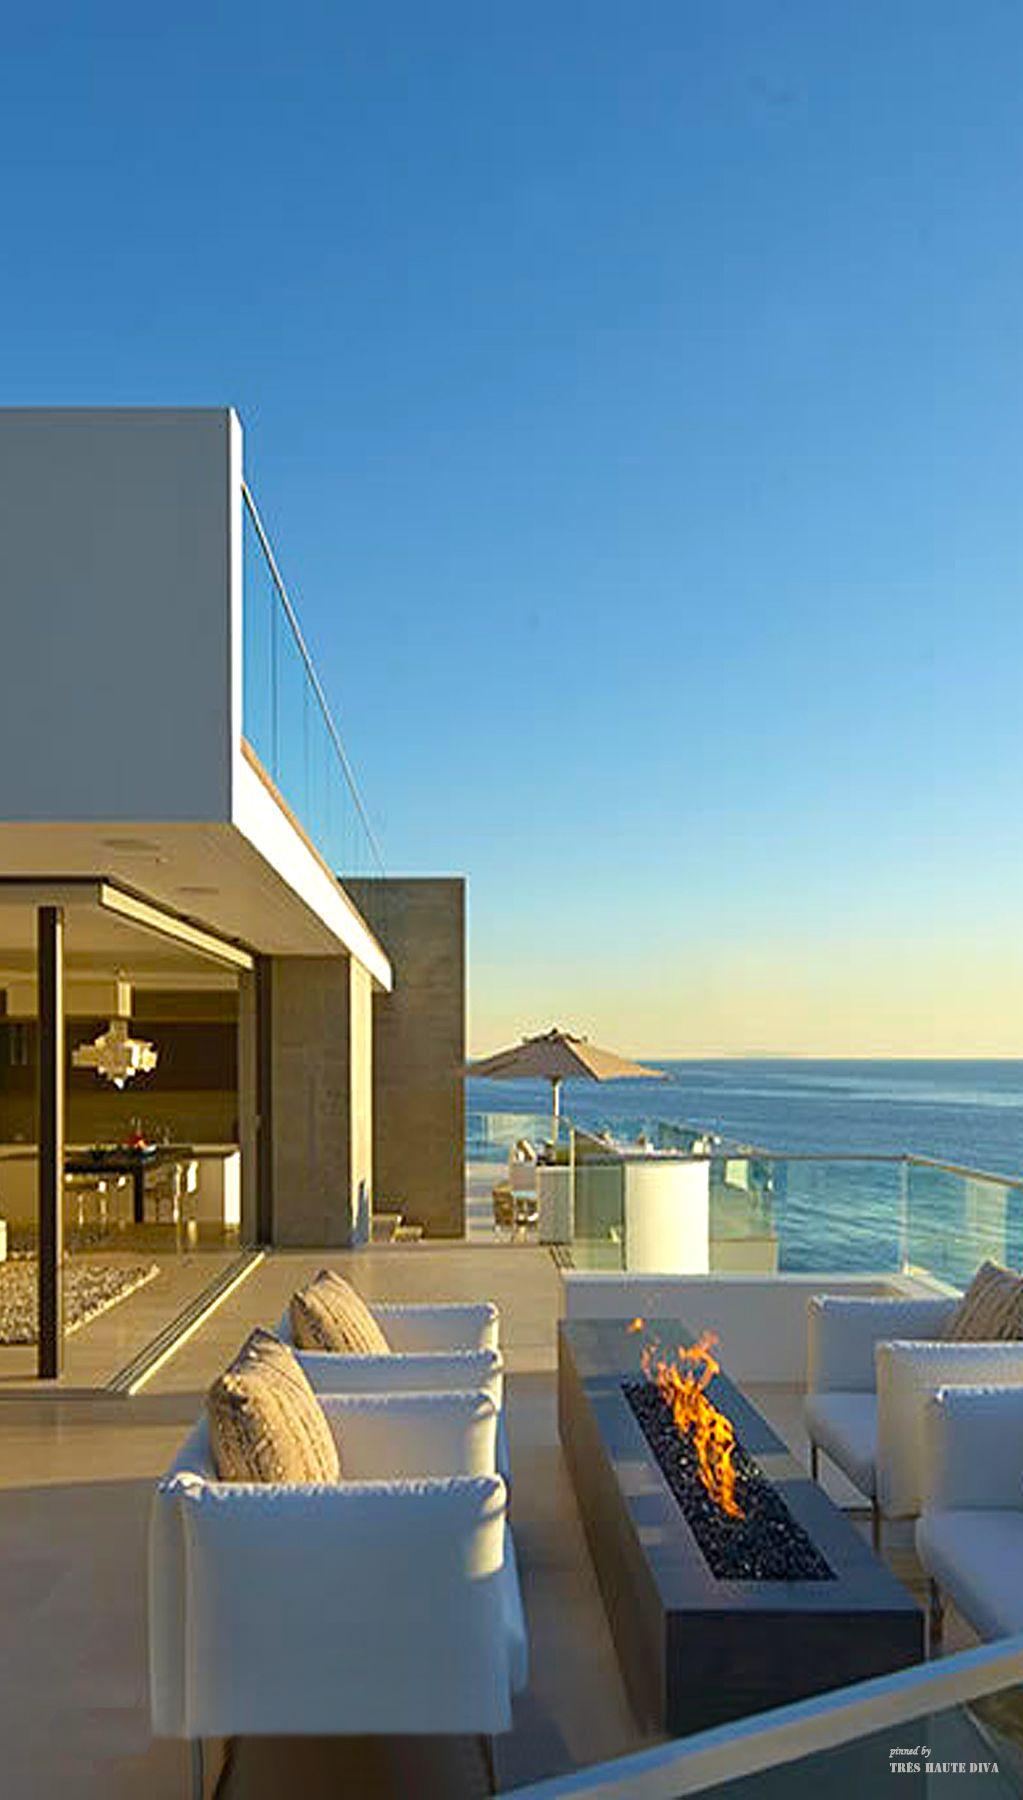 explore beautiful beach houses and more